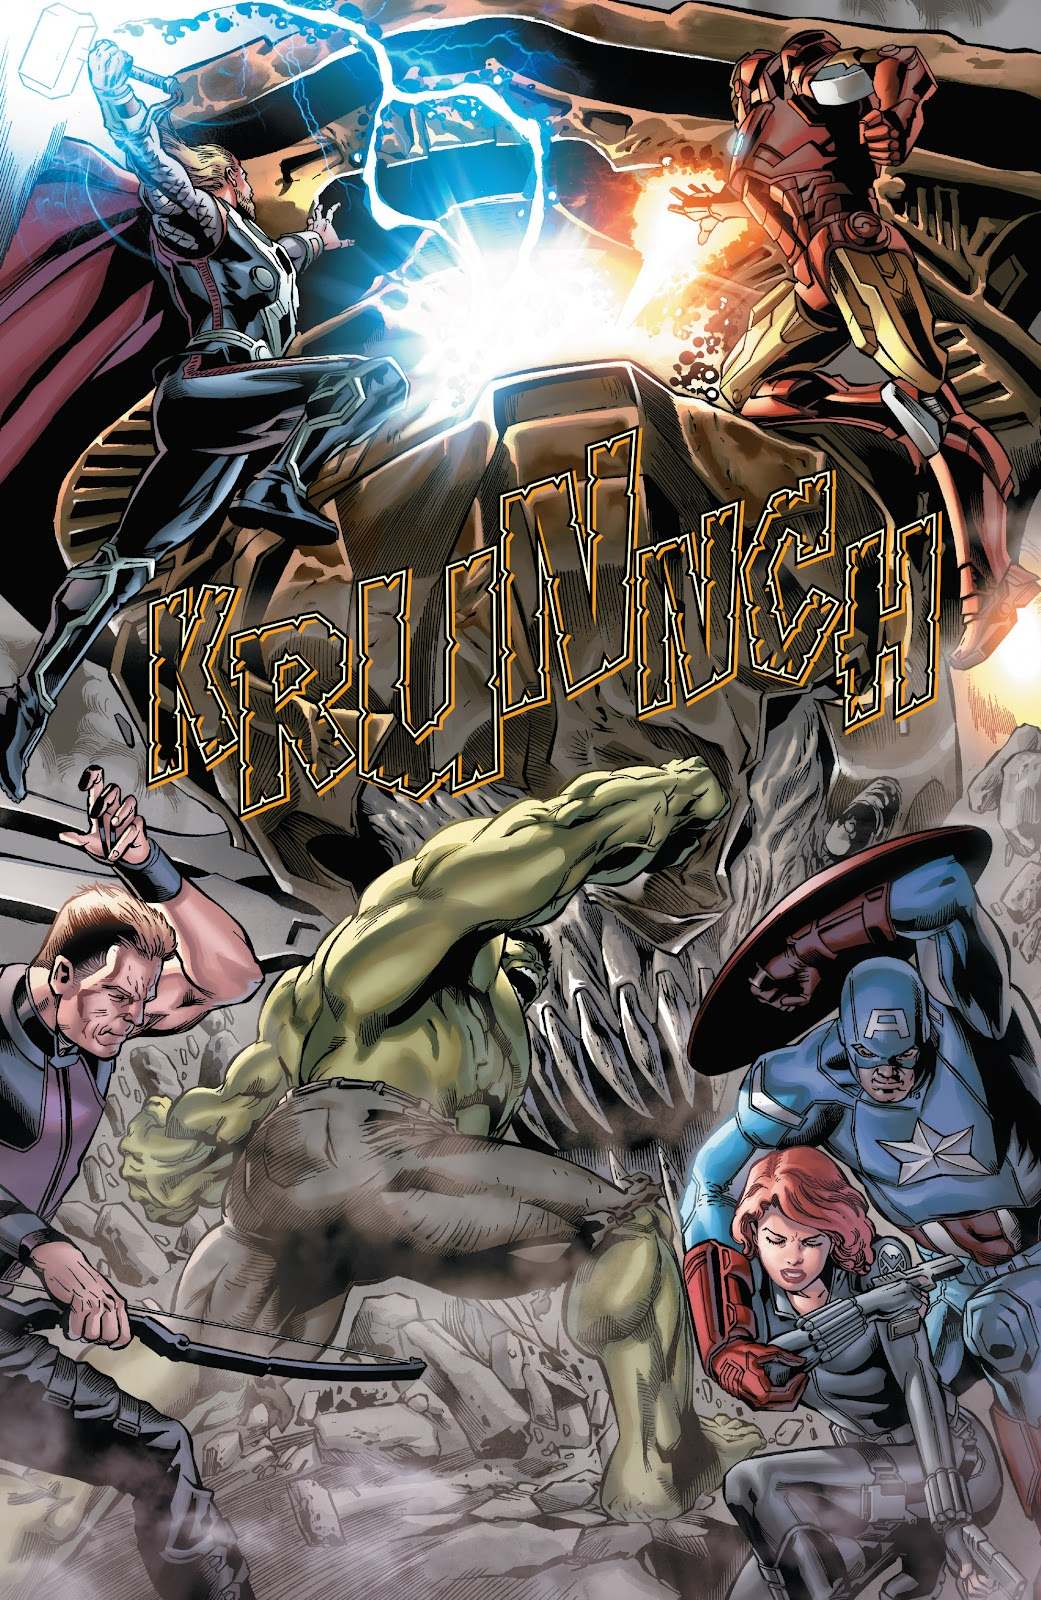 Read online Marvel's The Avengers comic -  Issue #2 - 13